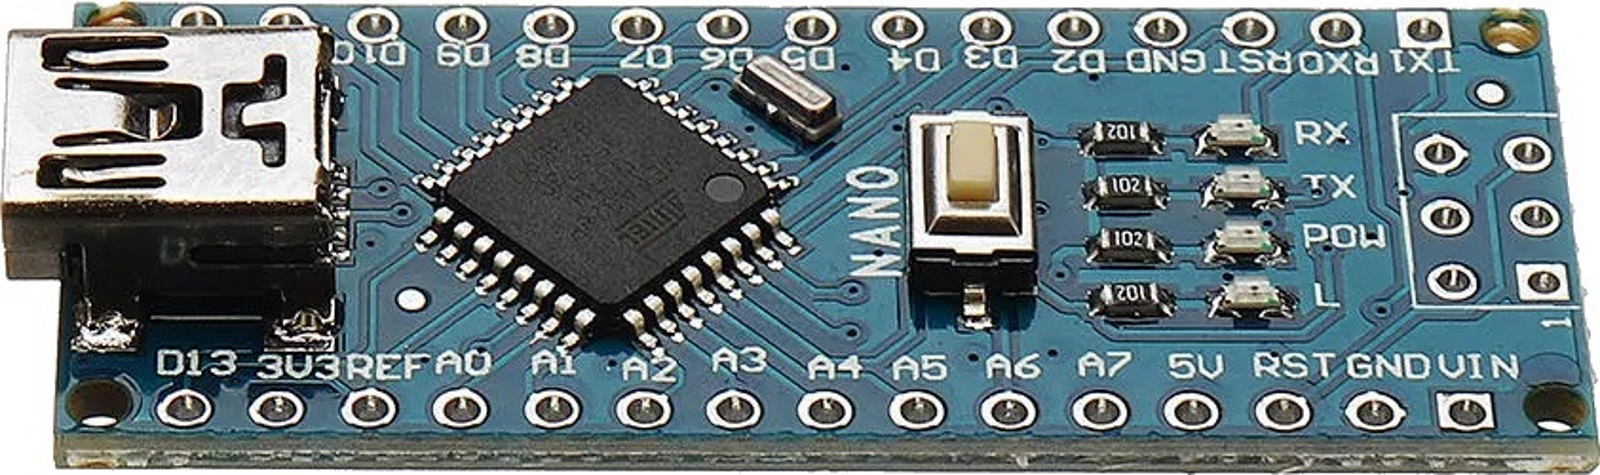 Un clone d'Arduino Nano